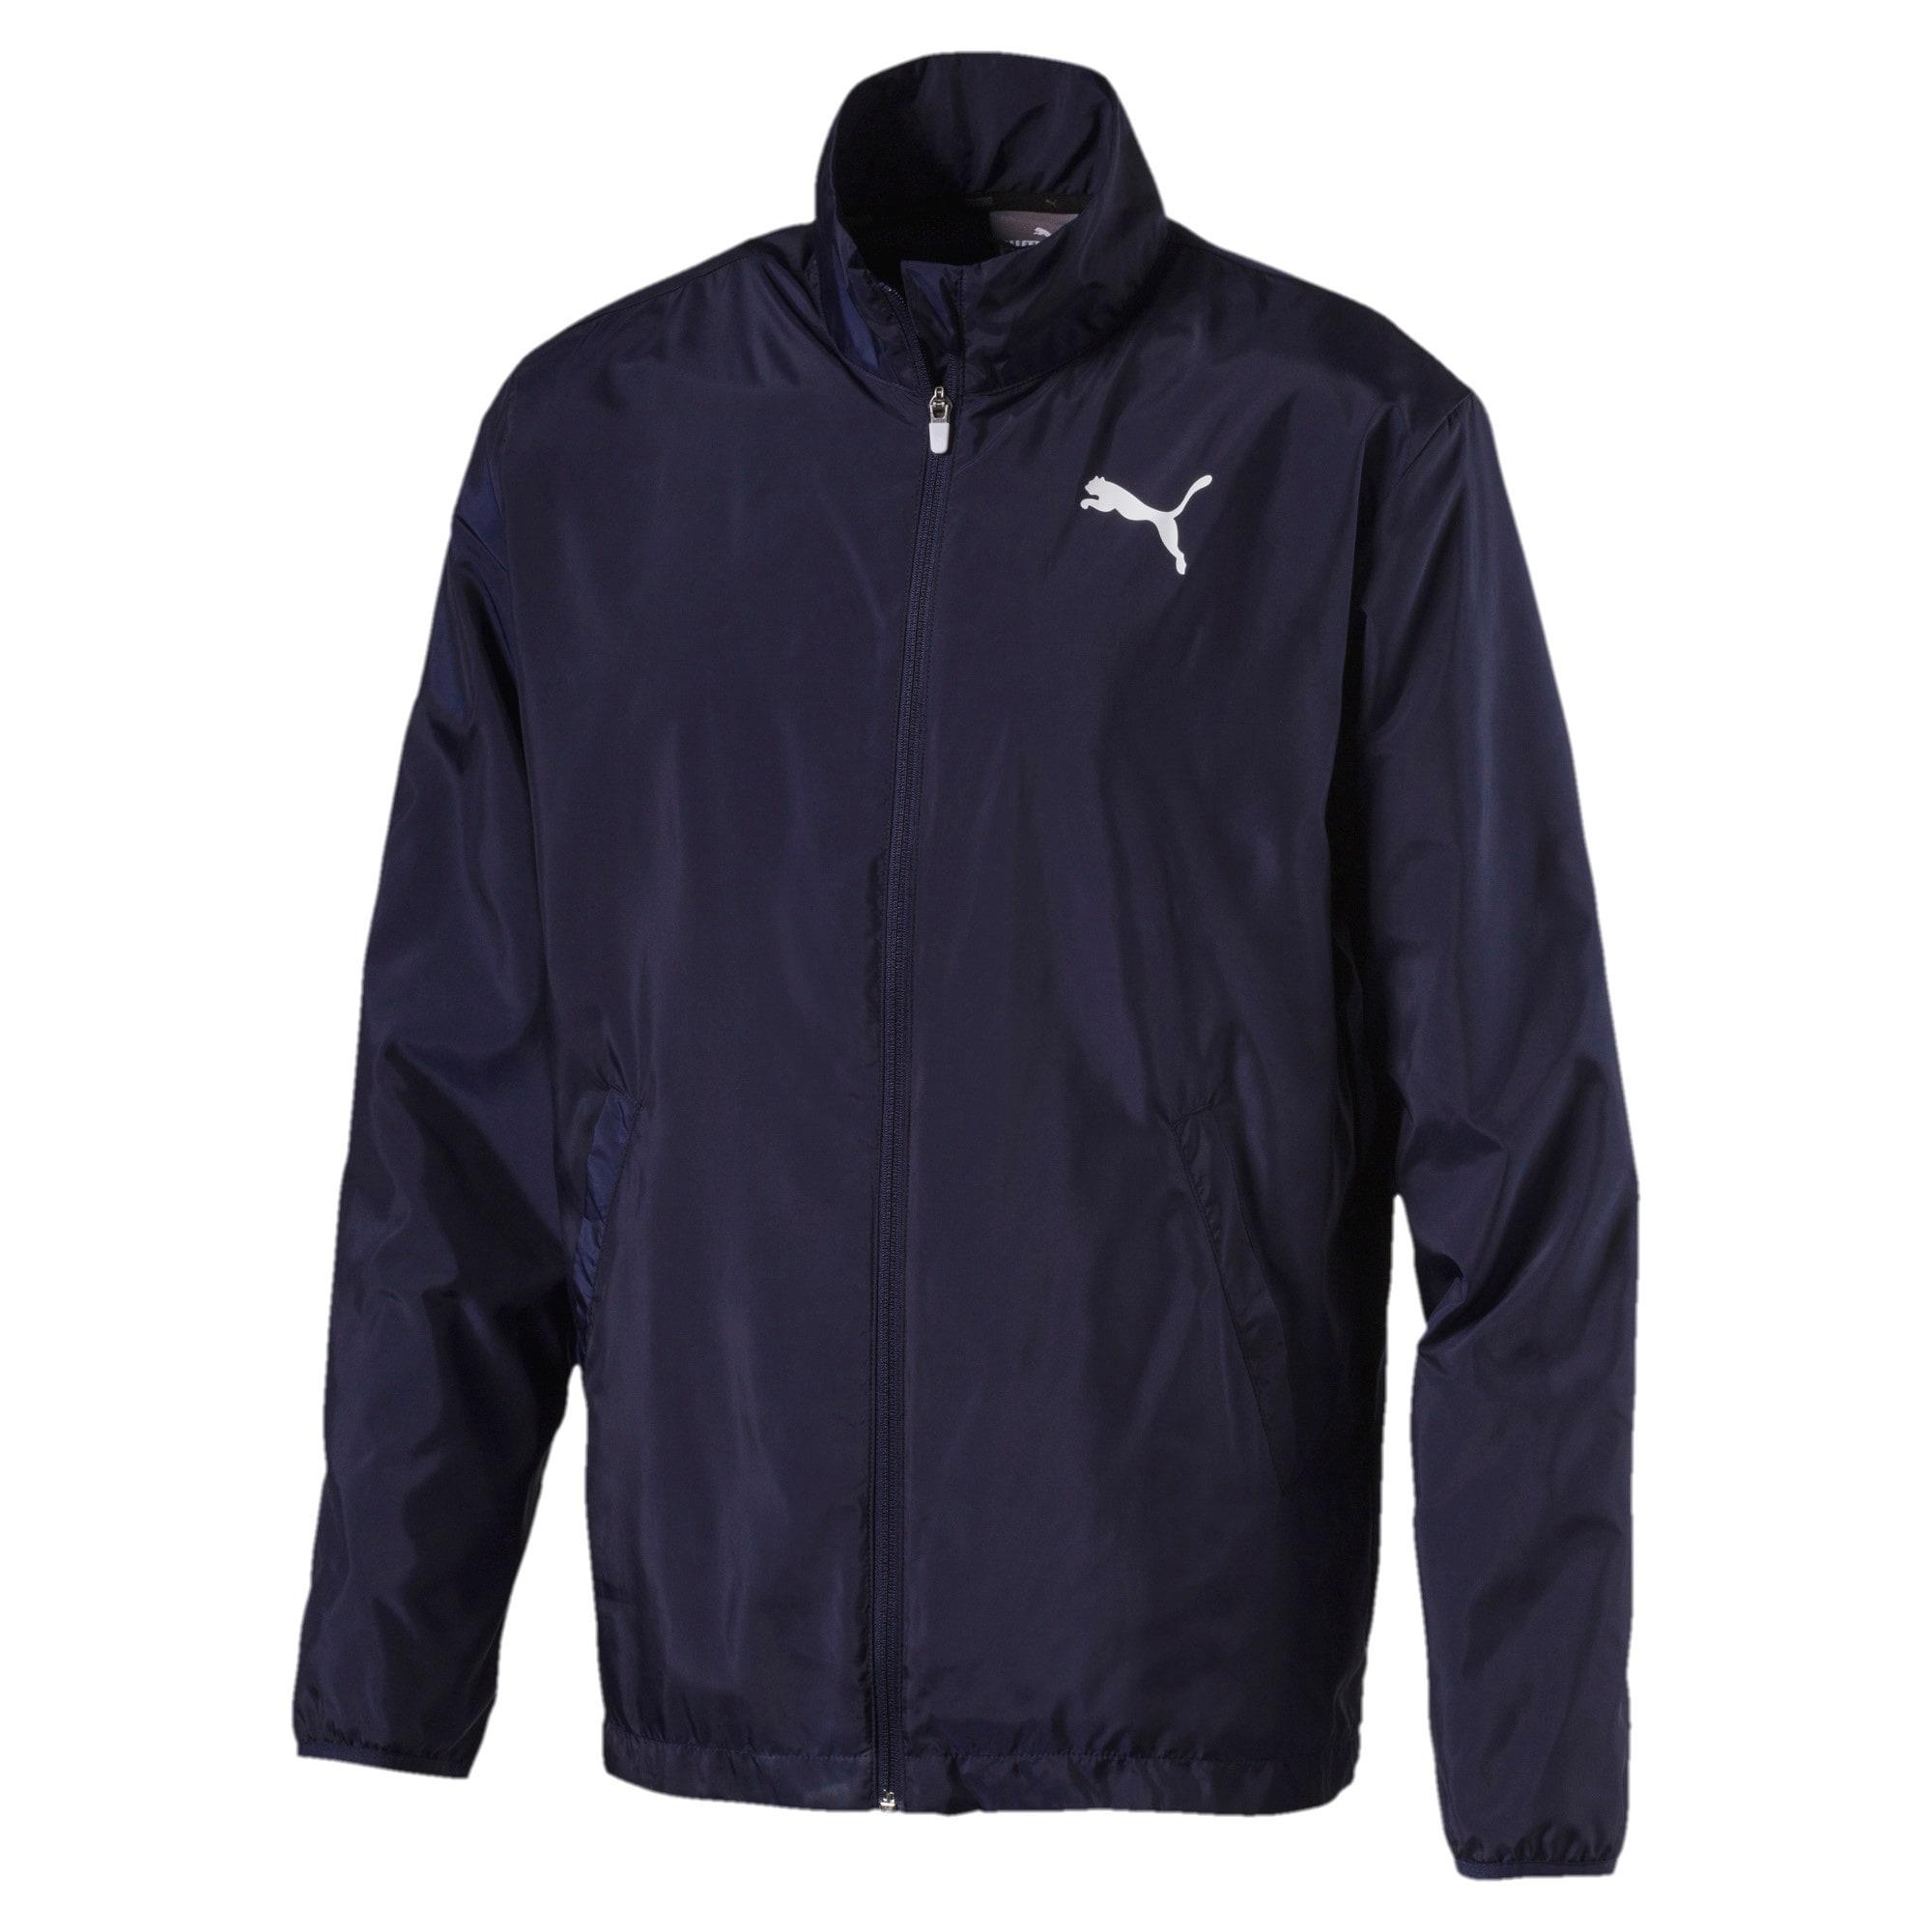 Thumbnail 1 of Active Full Zip Men's Jacket, Peacoat, medium